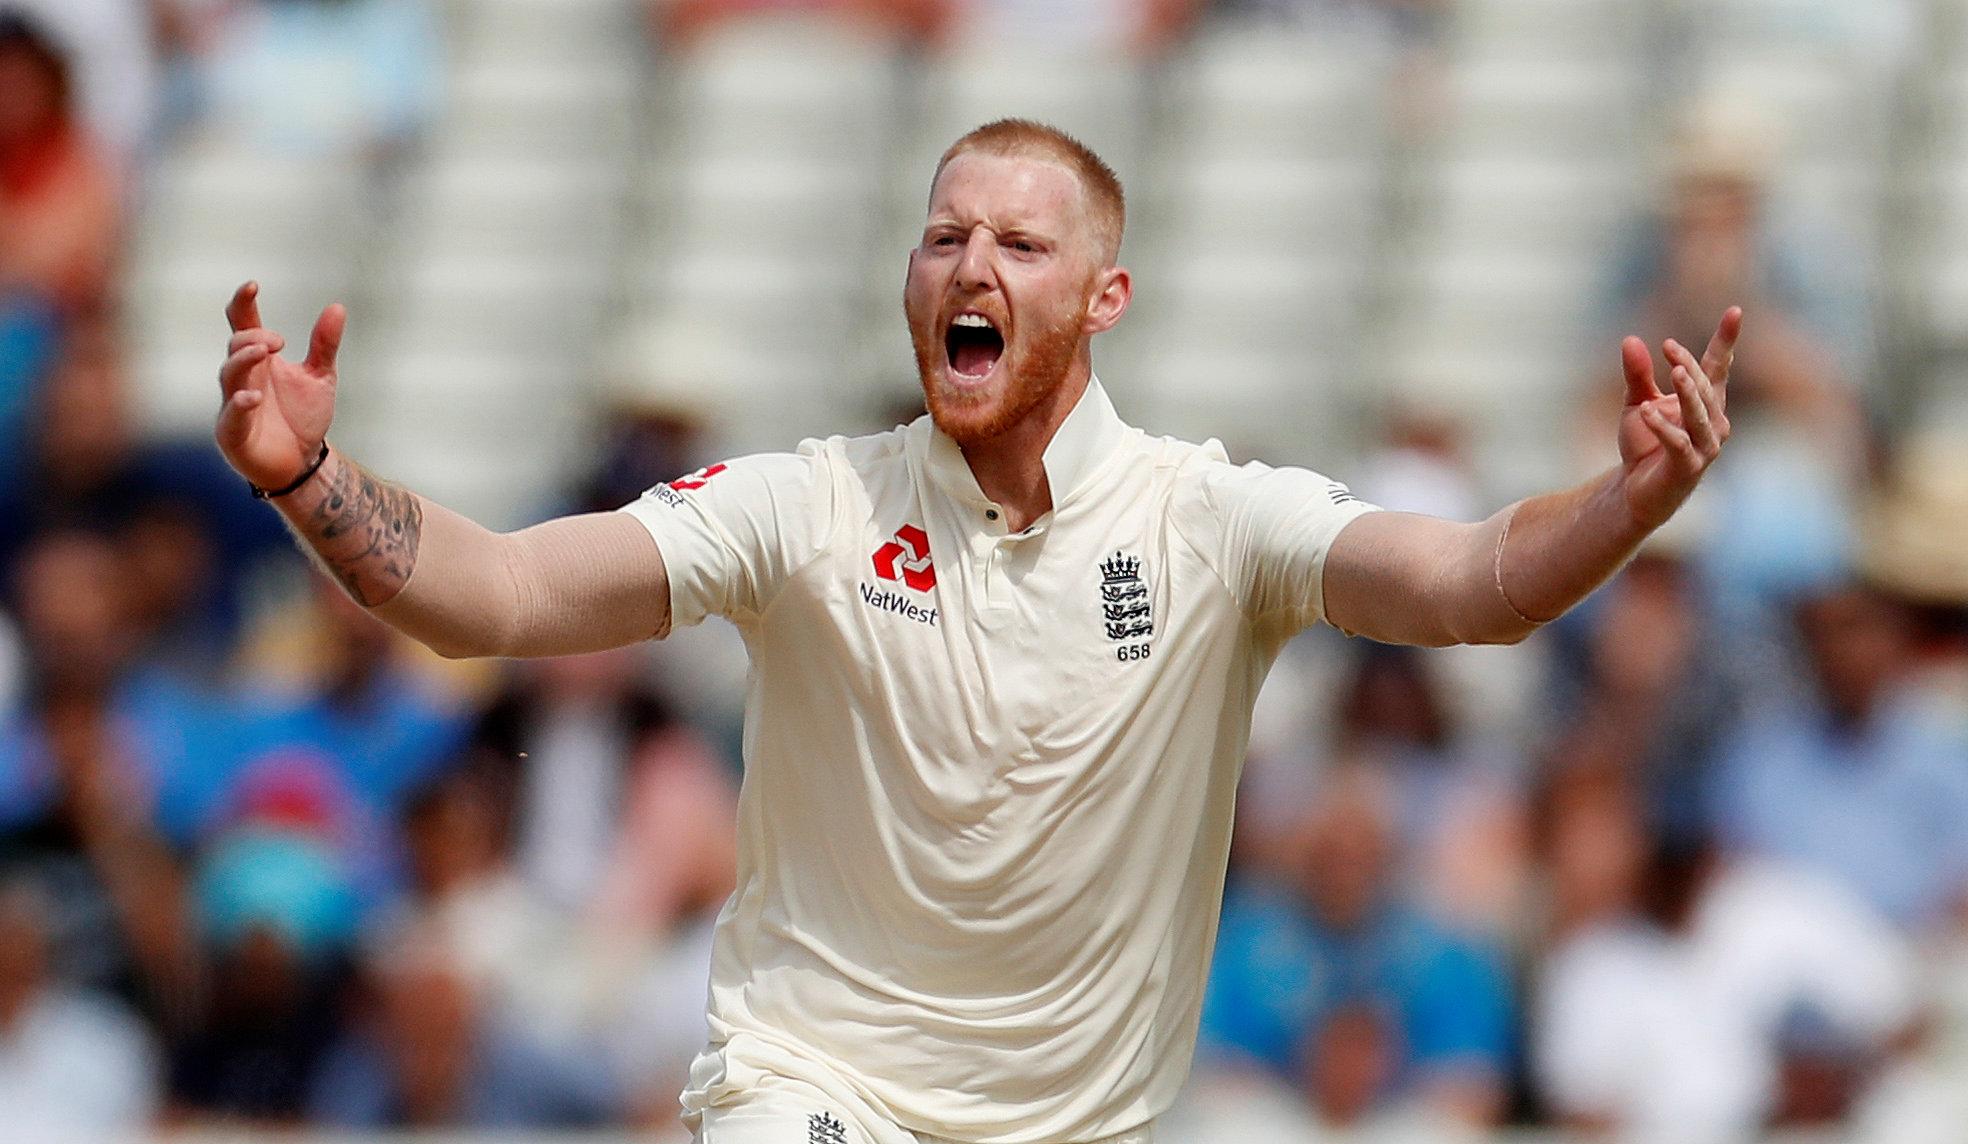 Cricket: England beat India to take 1-0 lead